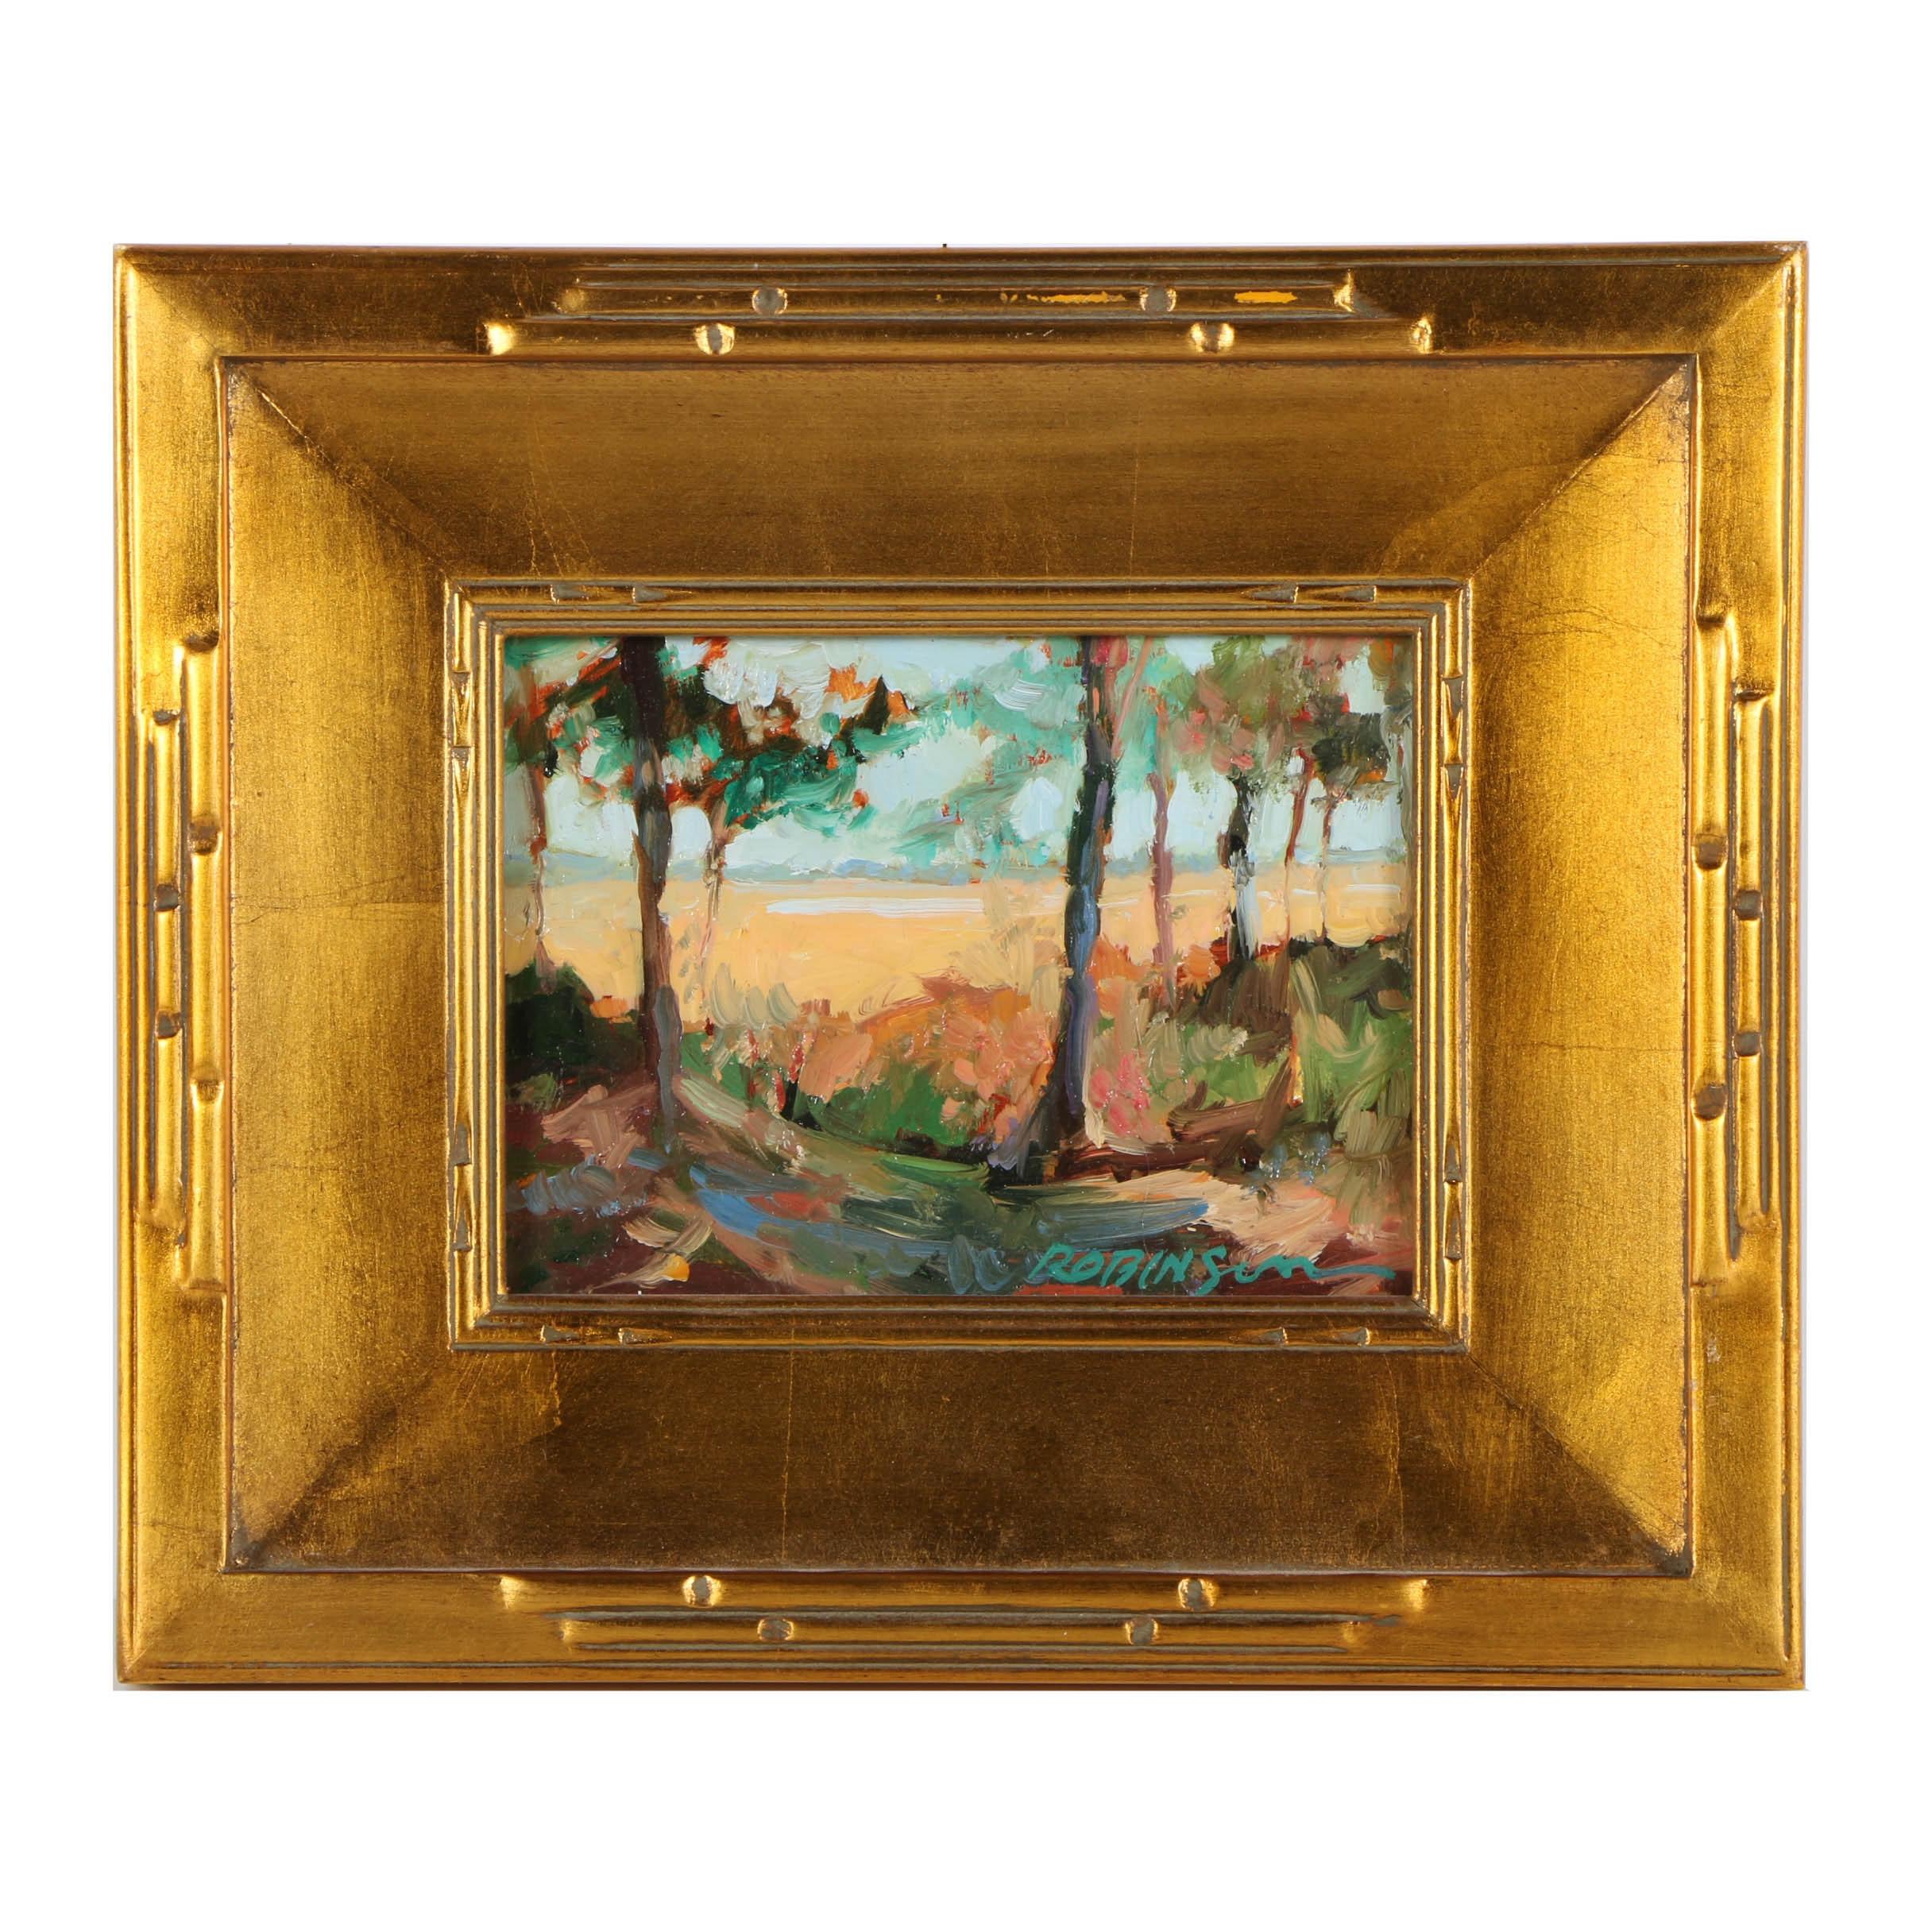 "Lori Keith Robinson Oil Painting on Board ""Skidaway Pines"""